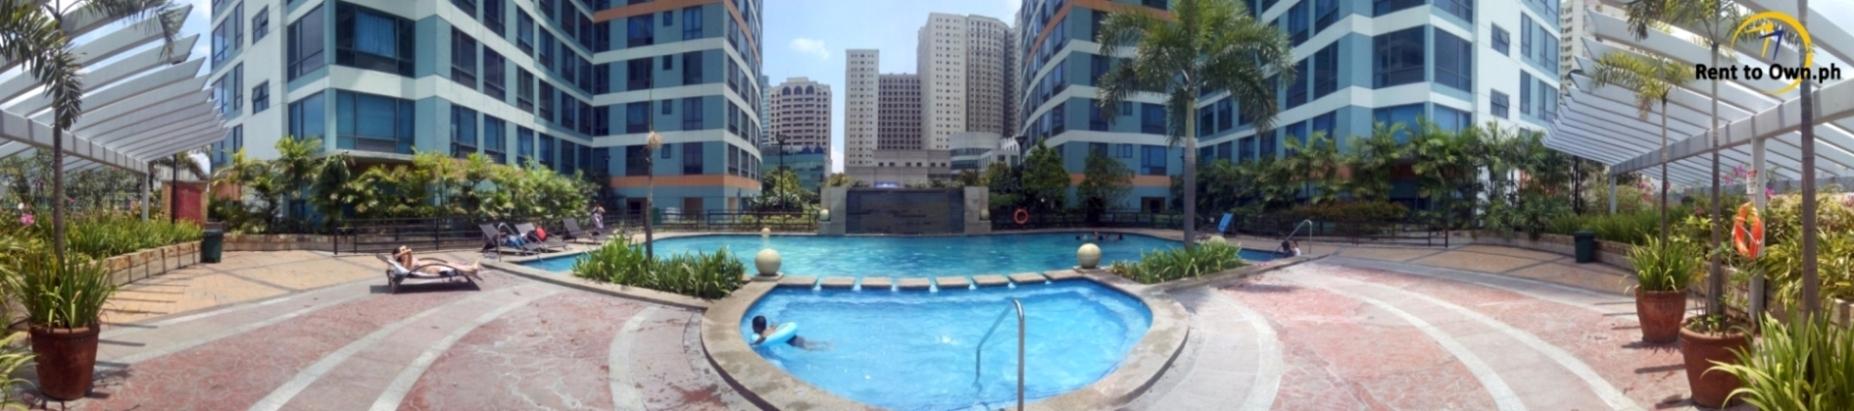 Swimming Pool 1 - http://www.renttoown.ph